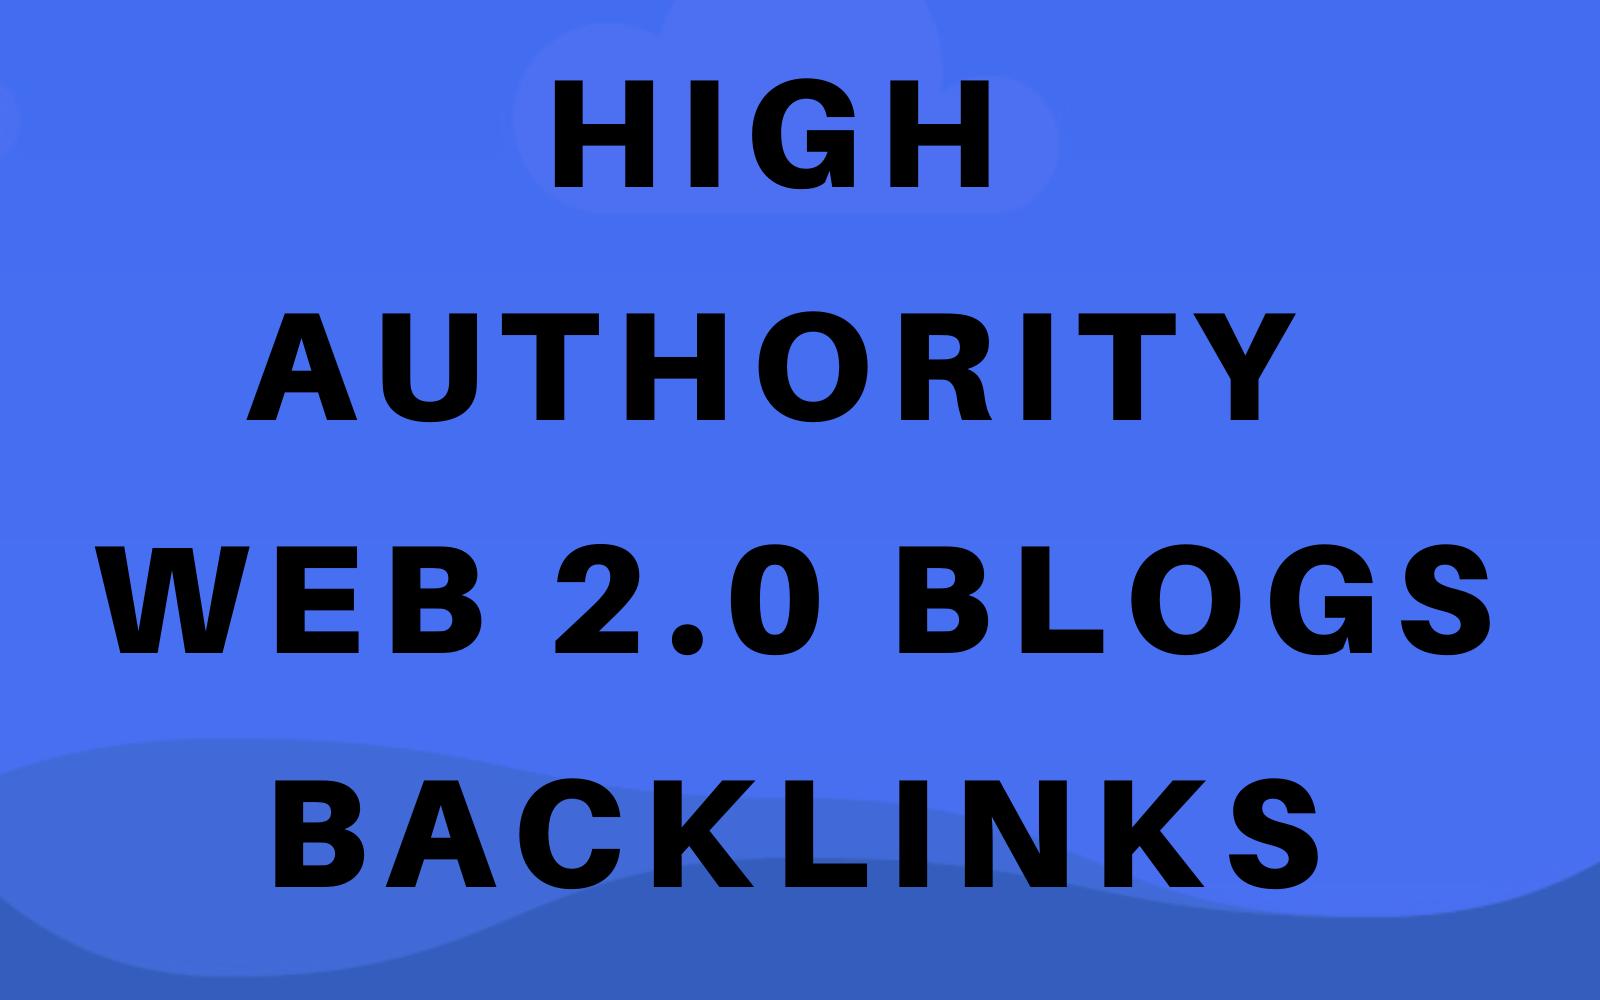 40 High Authority Web 2.0 Blogs Backlinks Boost Google Ranks